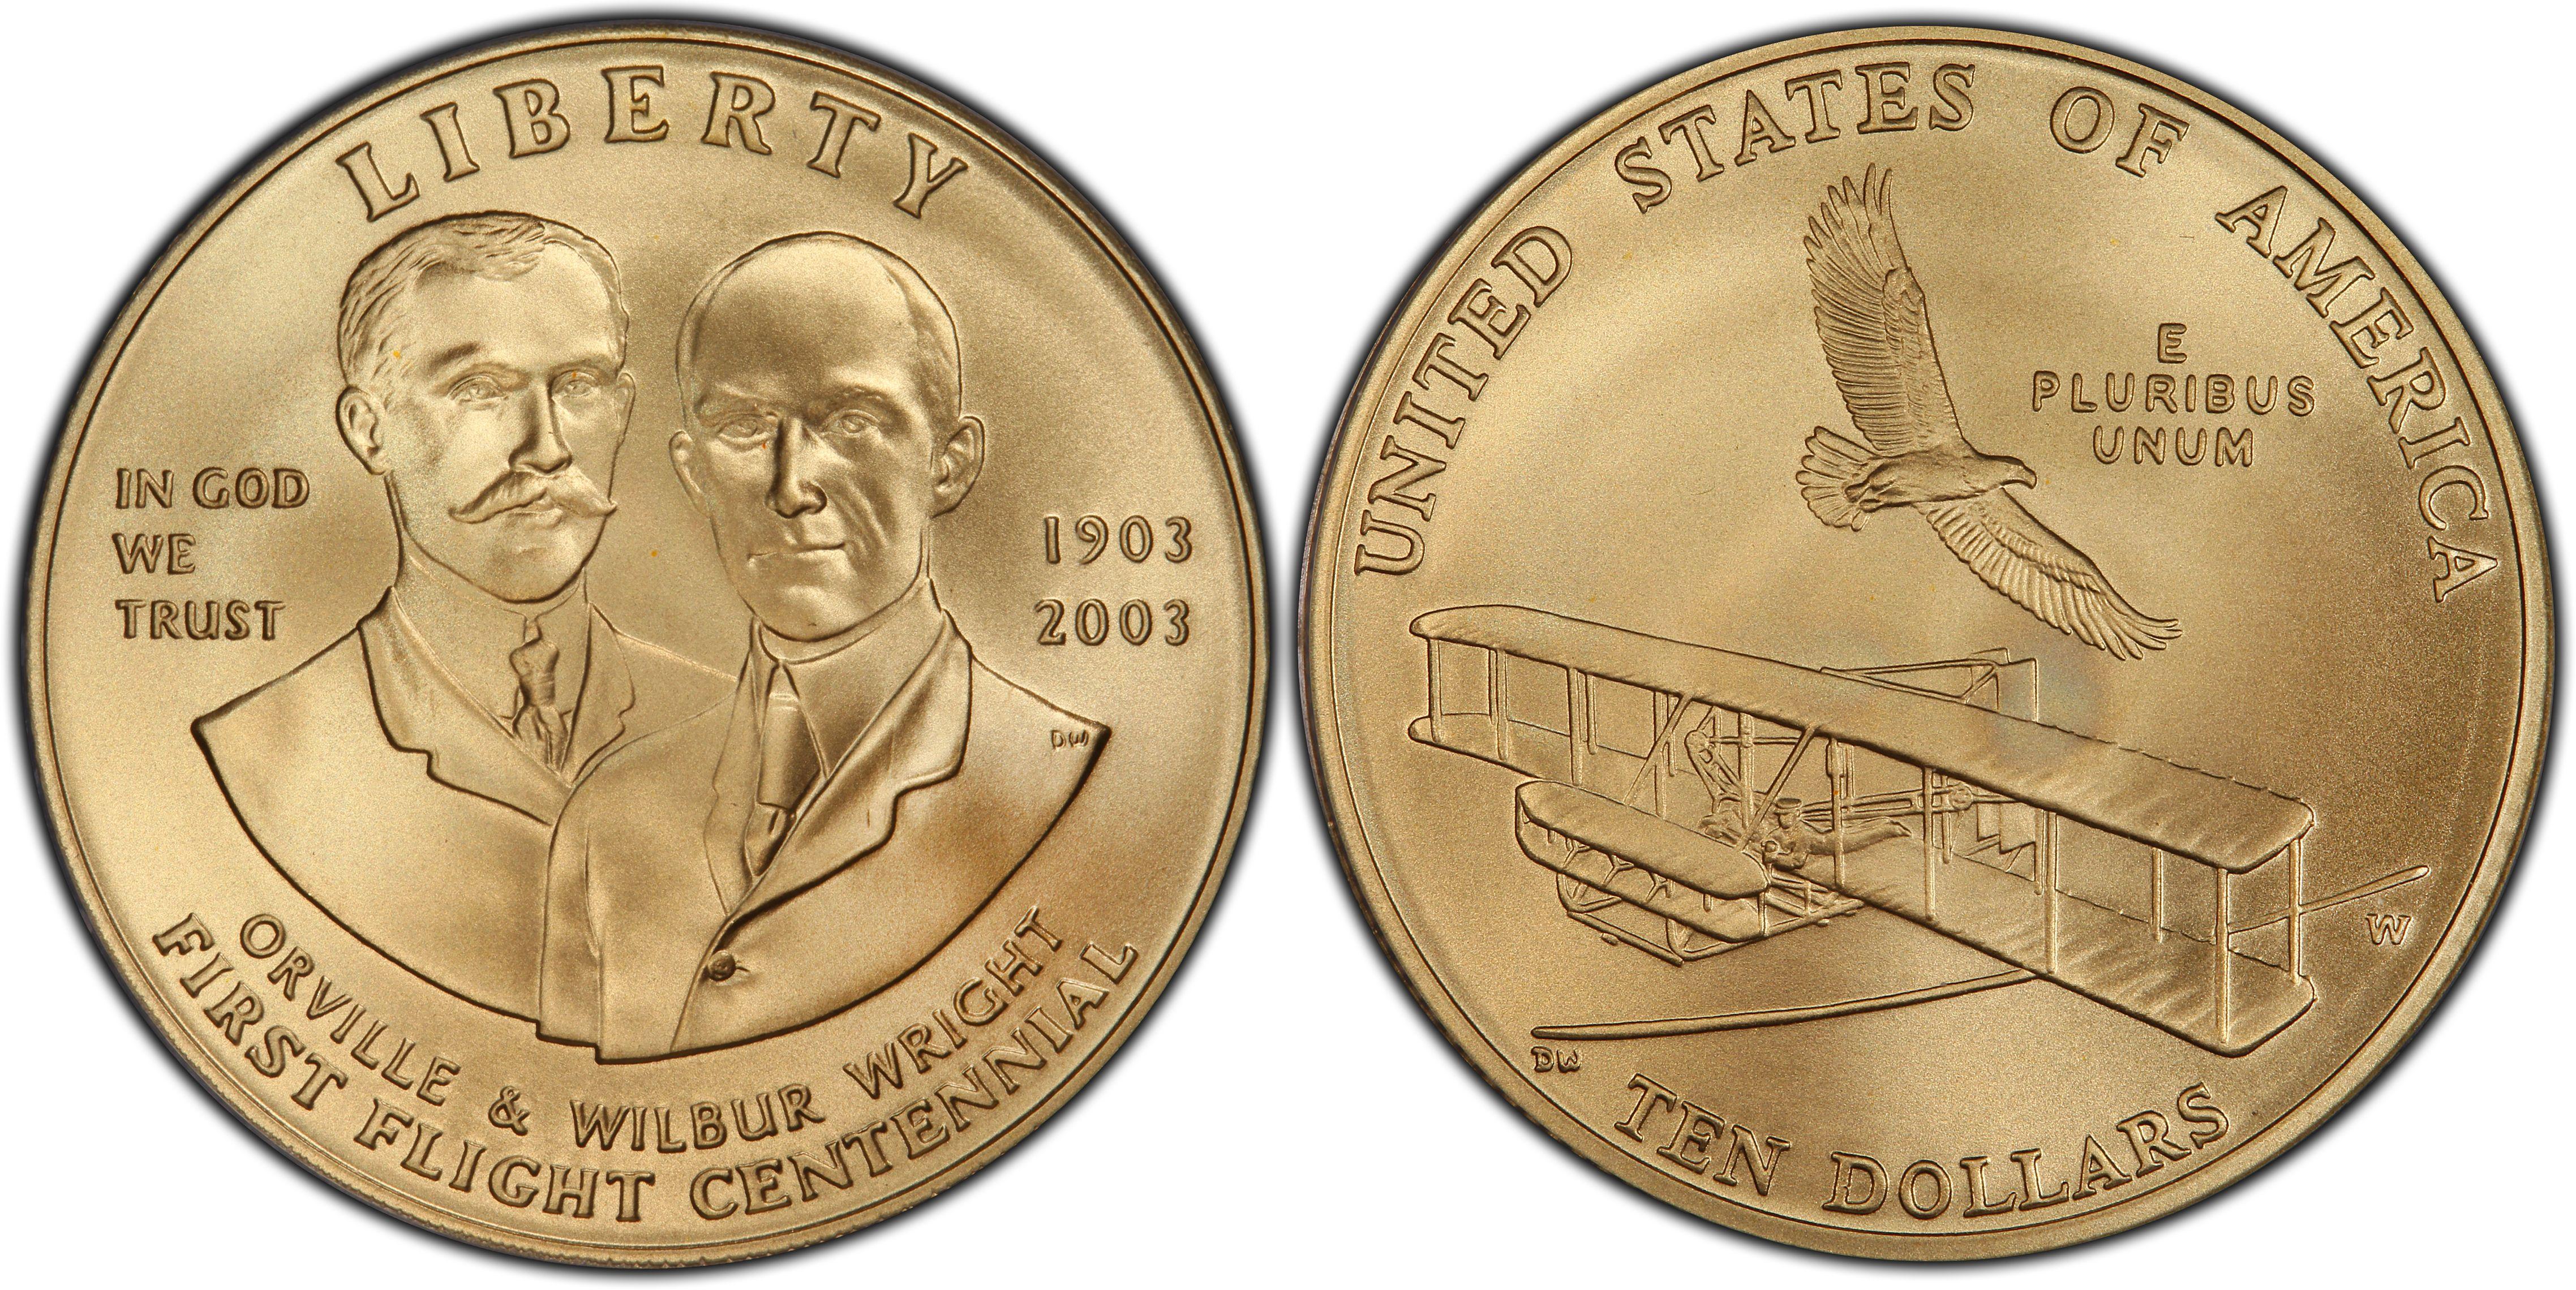 2003 First Flight Centennial Wright Bros Airplane BU Silver Dollar Coin ONLY